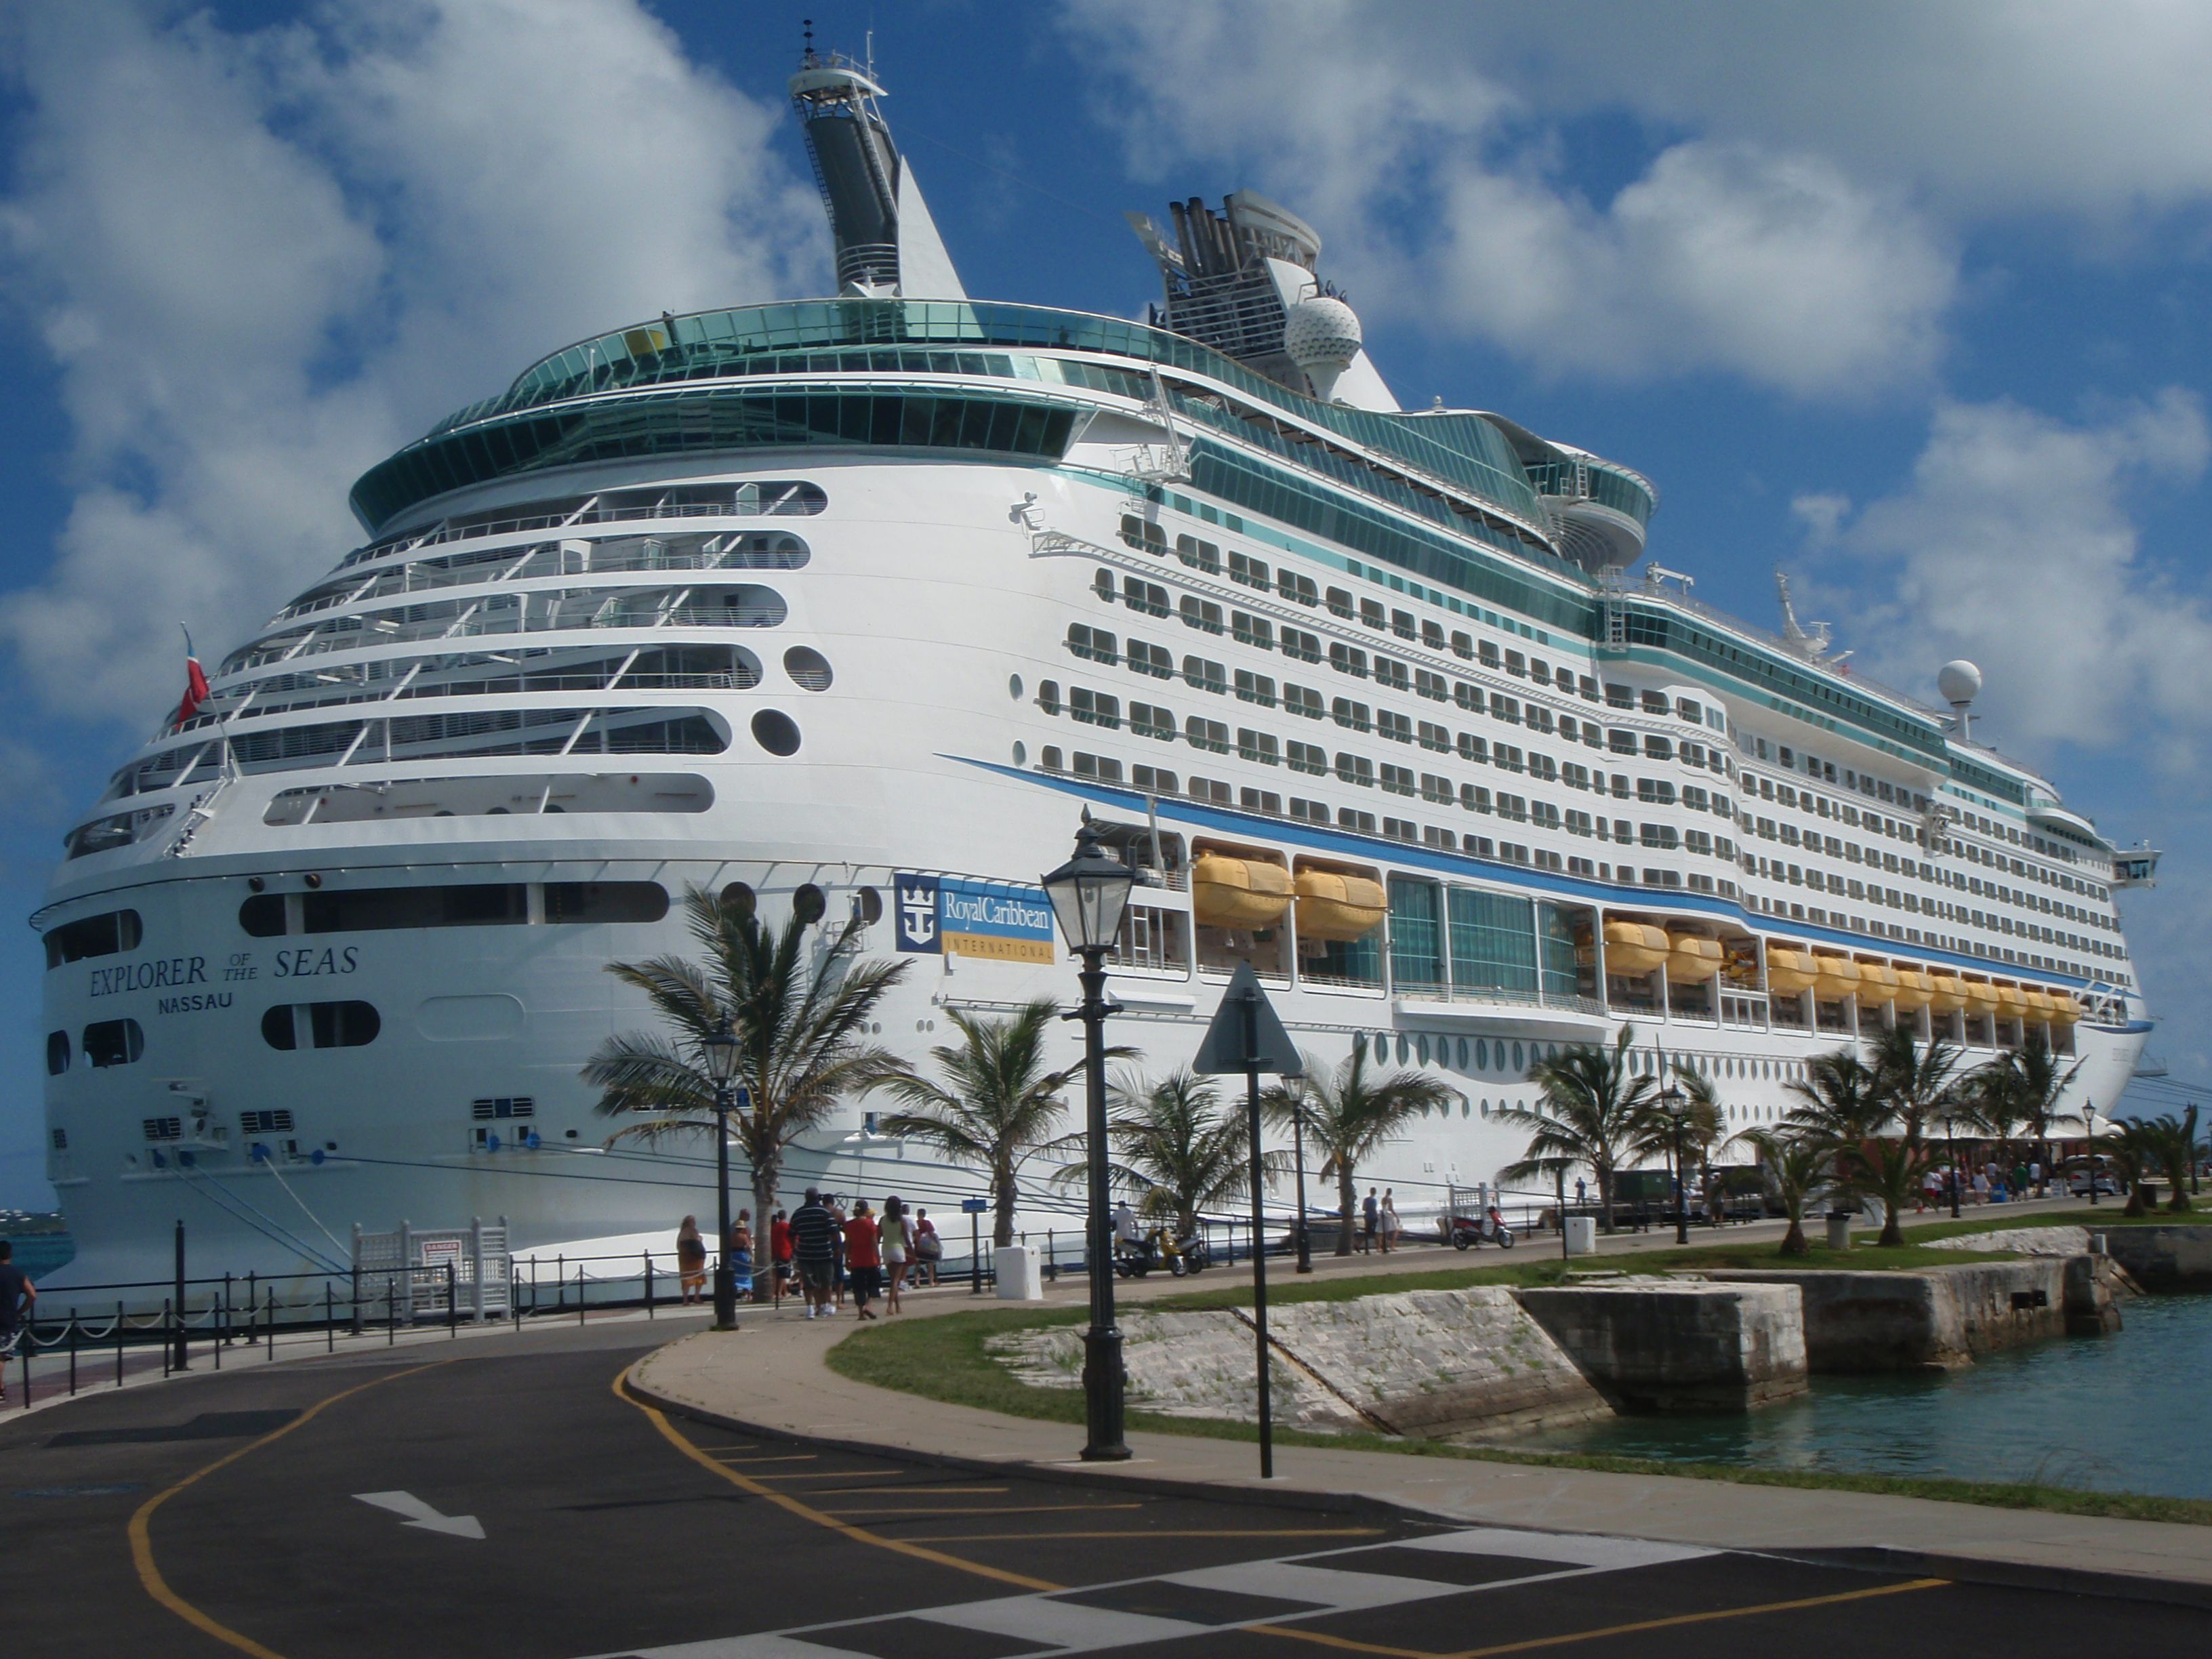 Bermuda cruise deals best cruises to bermuda - Royal Caribbean S Explorer Of The Seas Docked At Kings Wharf Bermuda